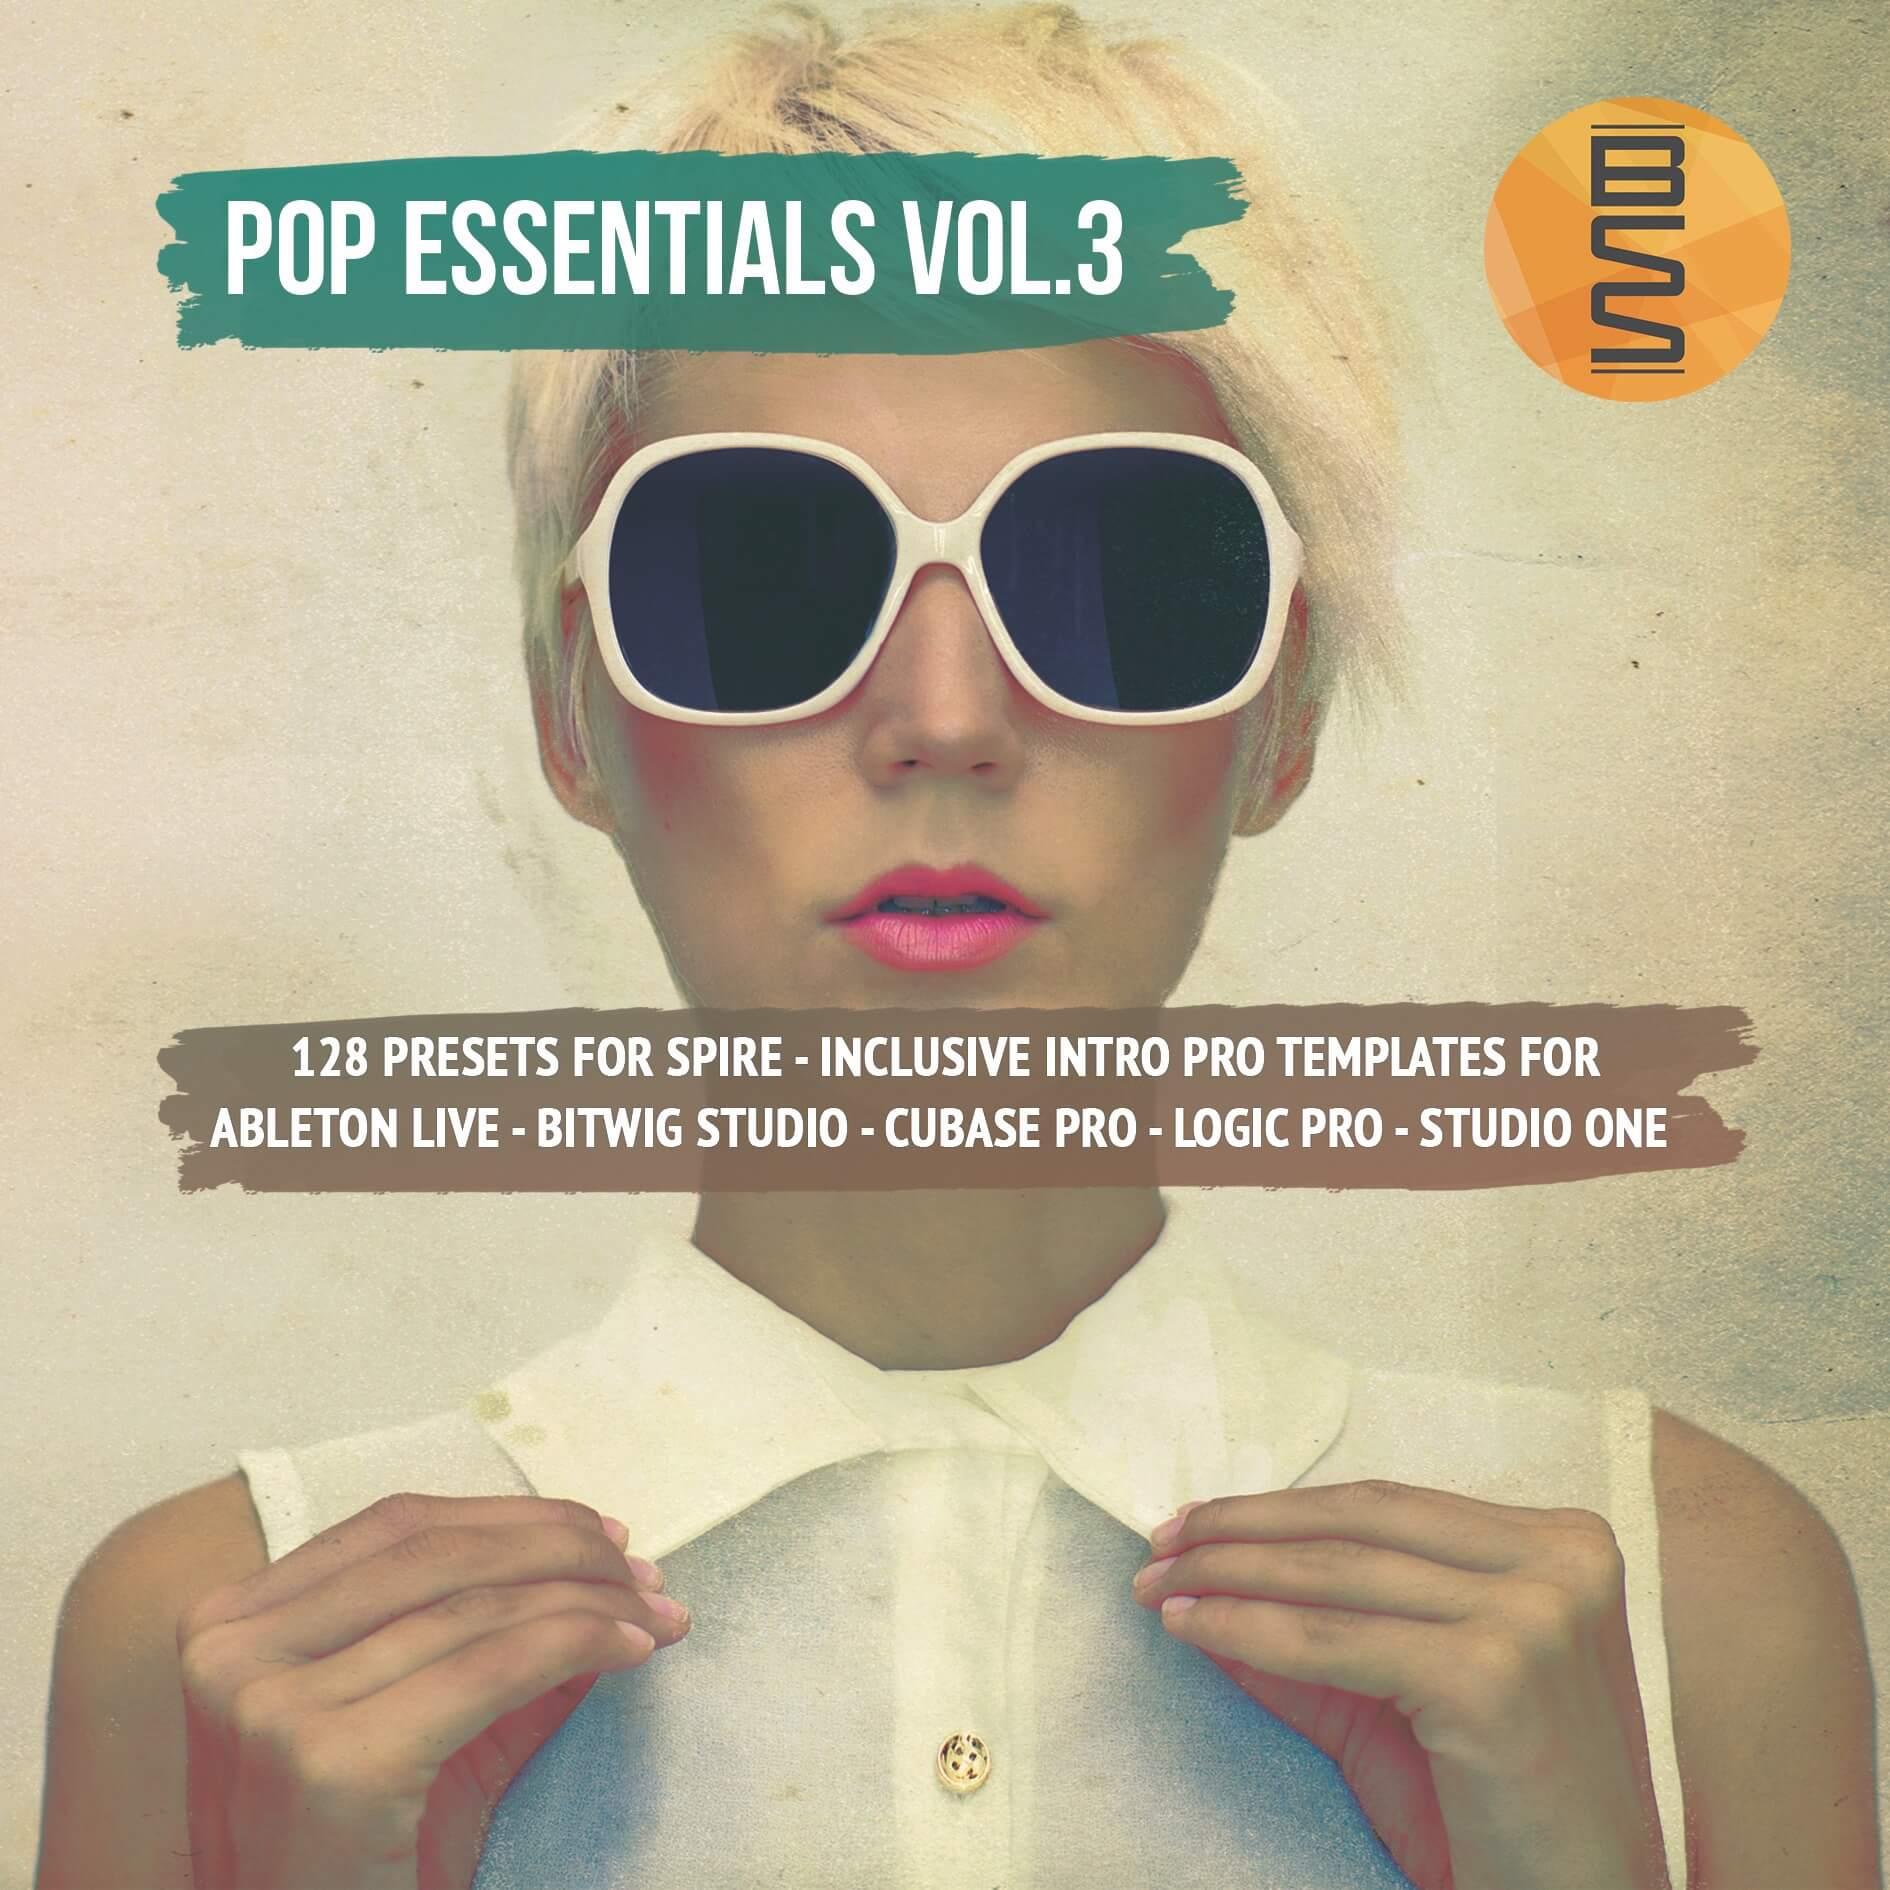 Big Sound Samples Pop Essentials Vol.3 for Spire